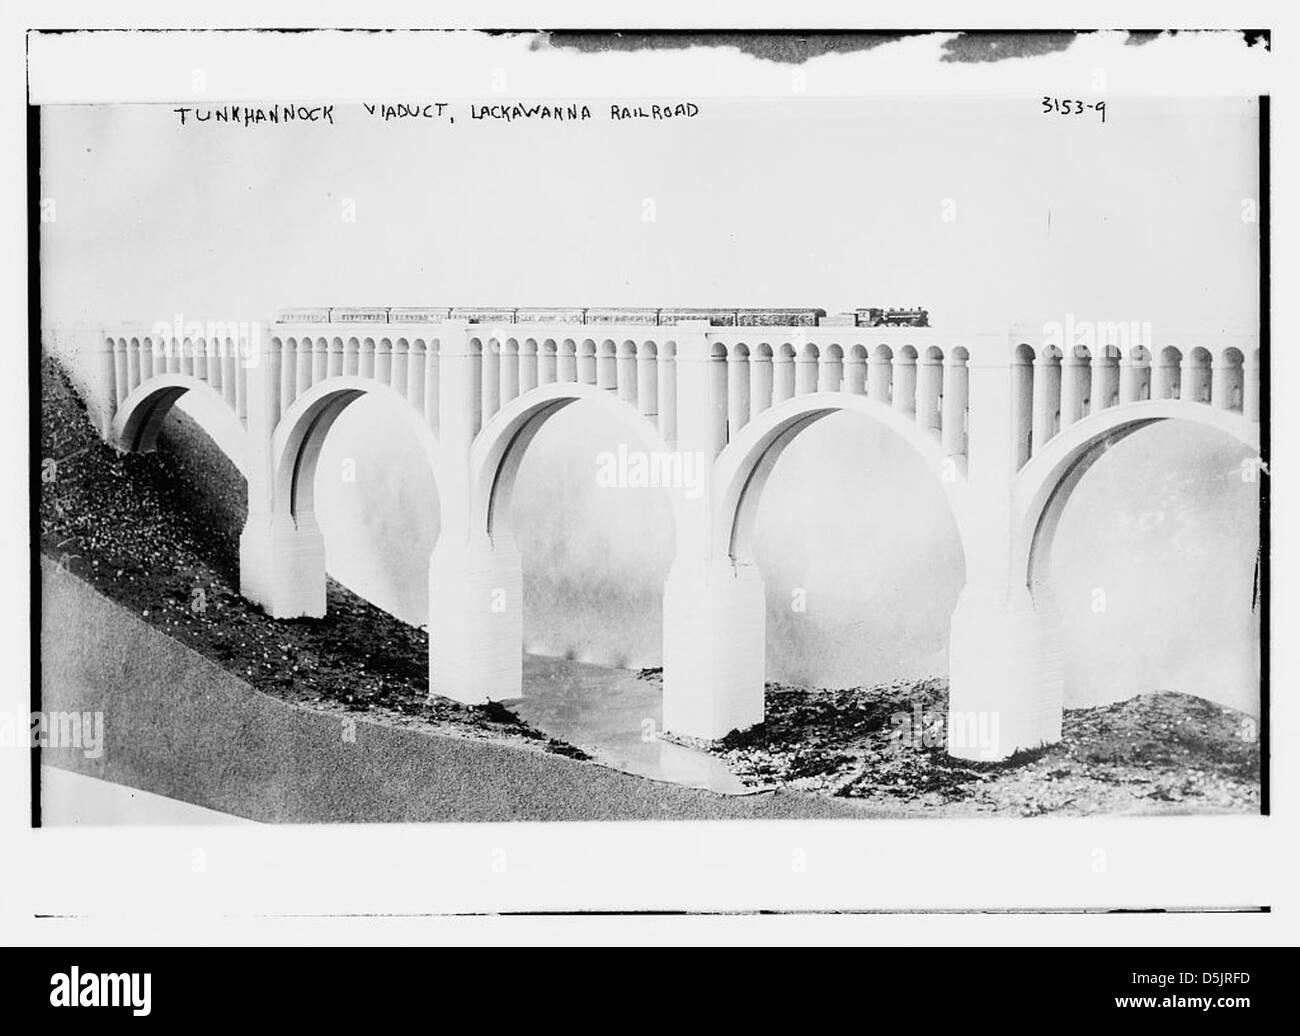 Tunkhannock Viaduct, Lackawanna RR (LOC) - Stock Image